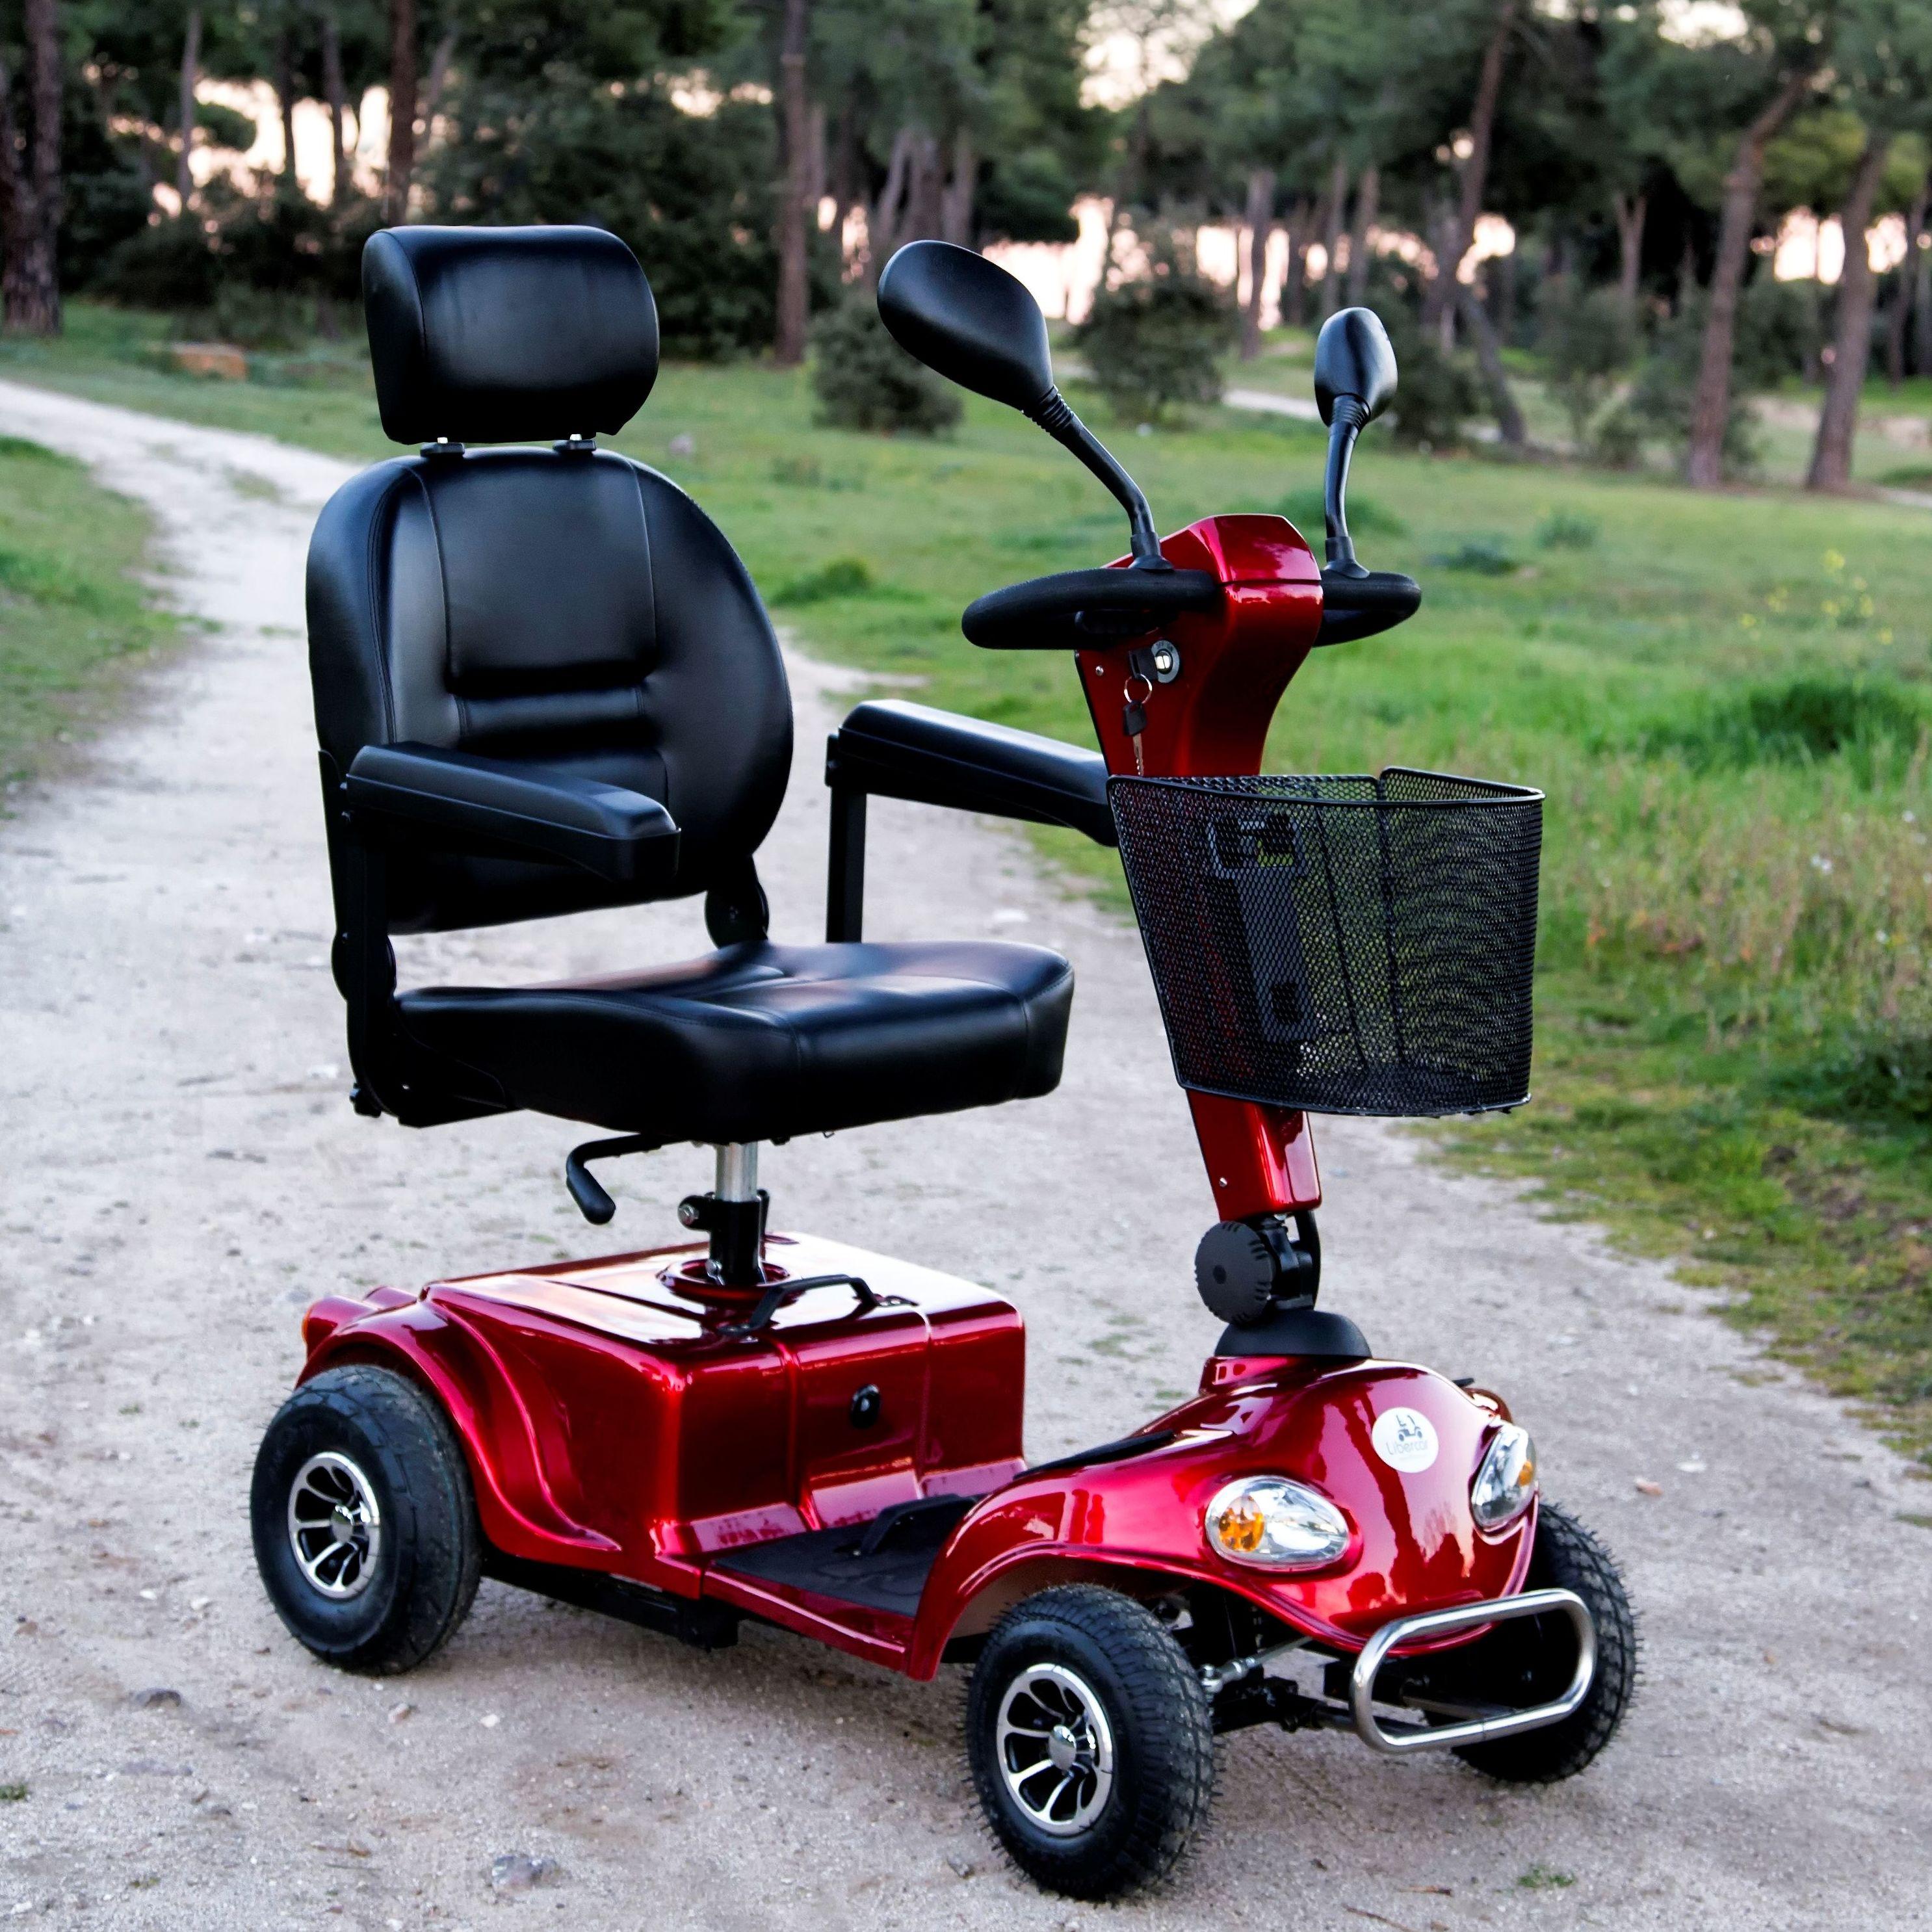 Scooter Dolce Vita